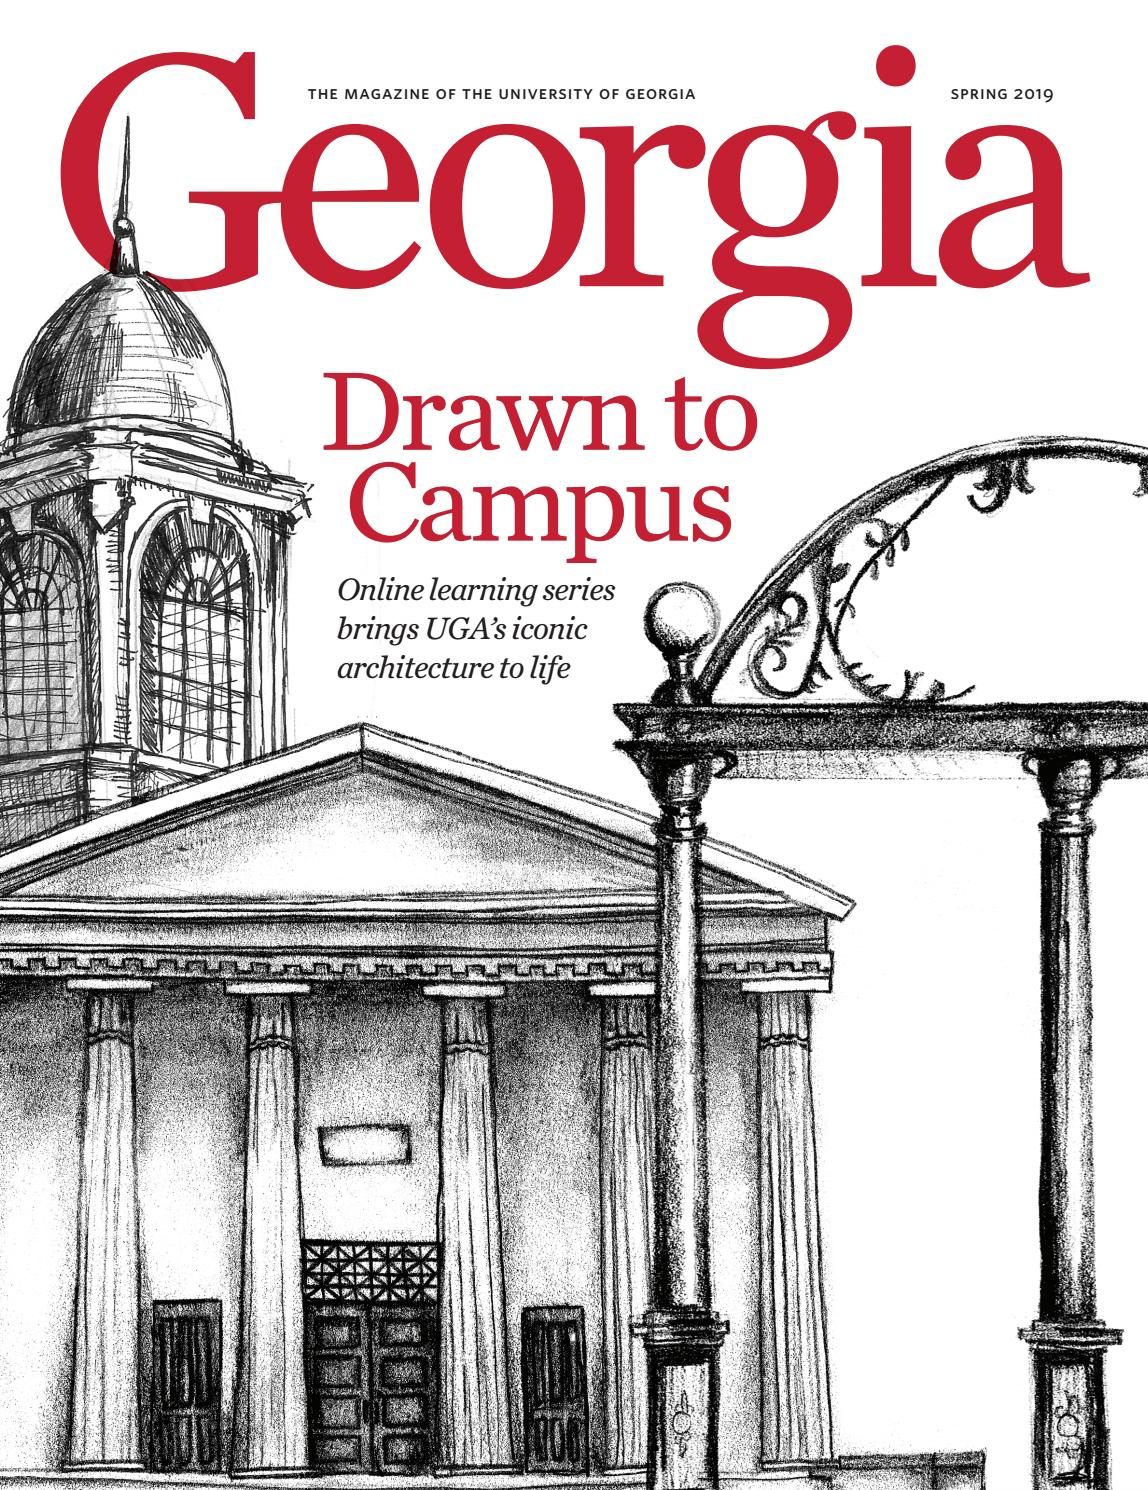 09b44753623 University of Georgia Magazine Spring 2019 by University of Georgia ...